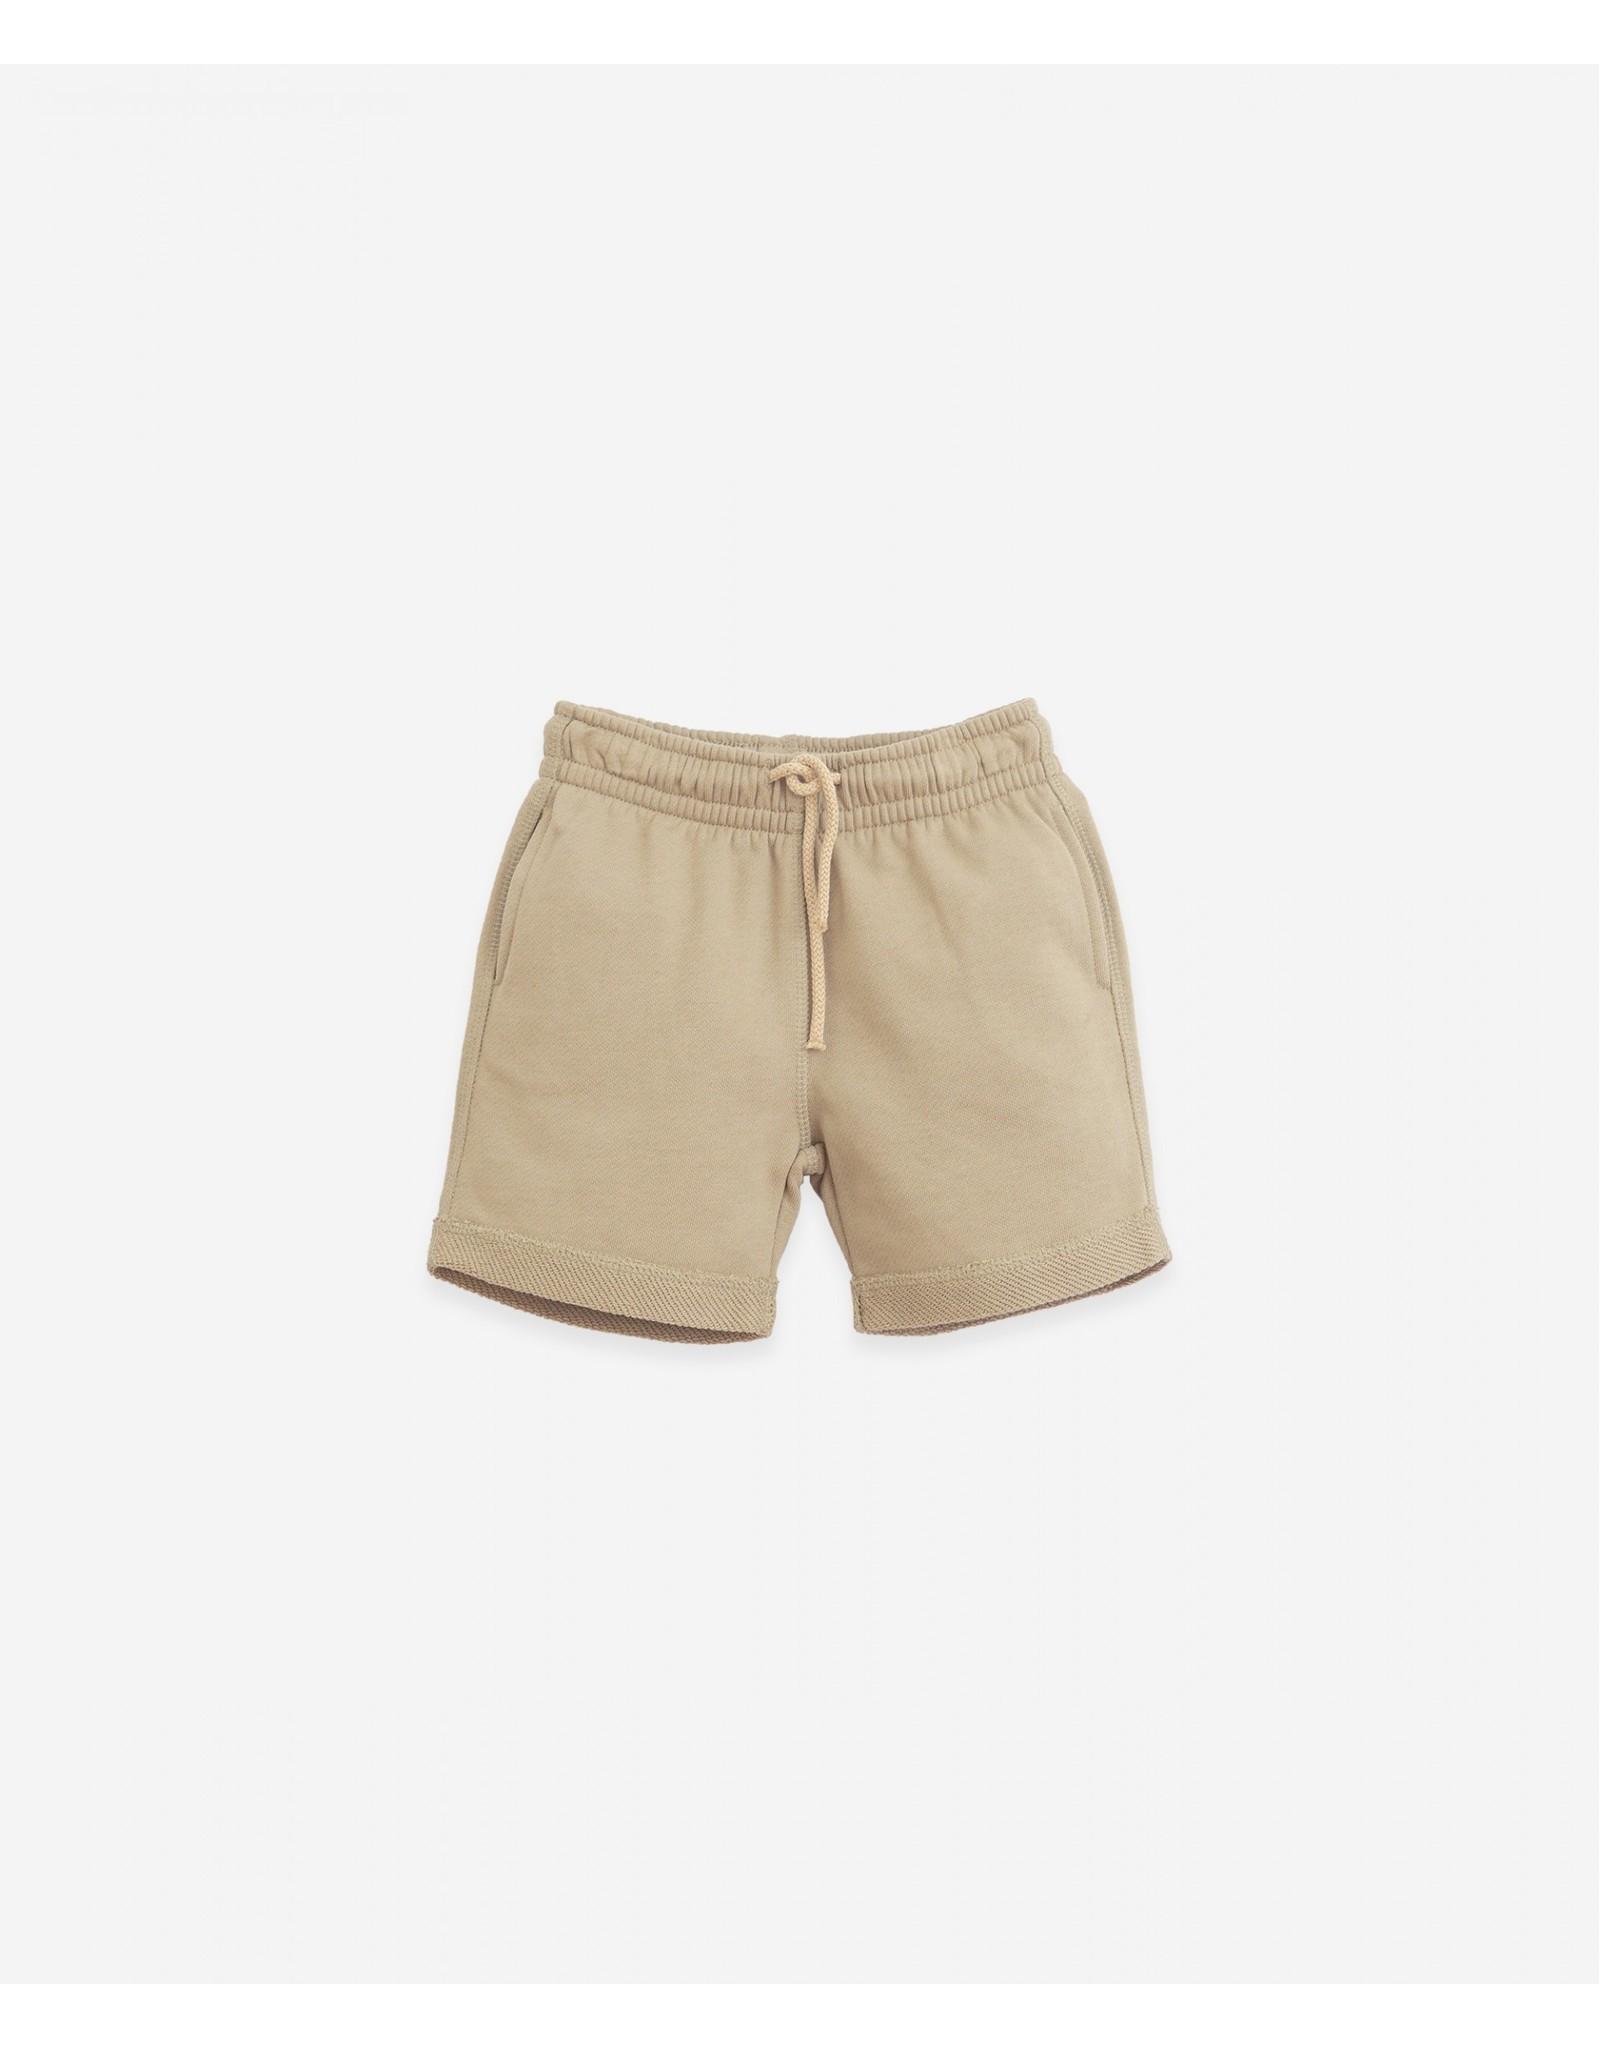 Play Up Play Up Organic cotton Shorts with pockets Botany Joäo